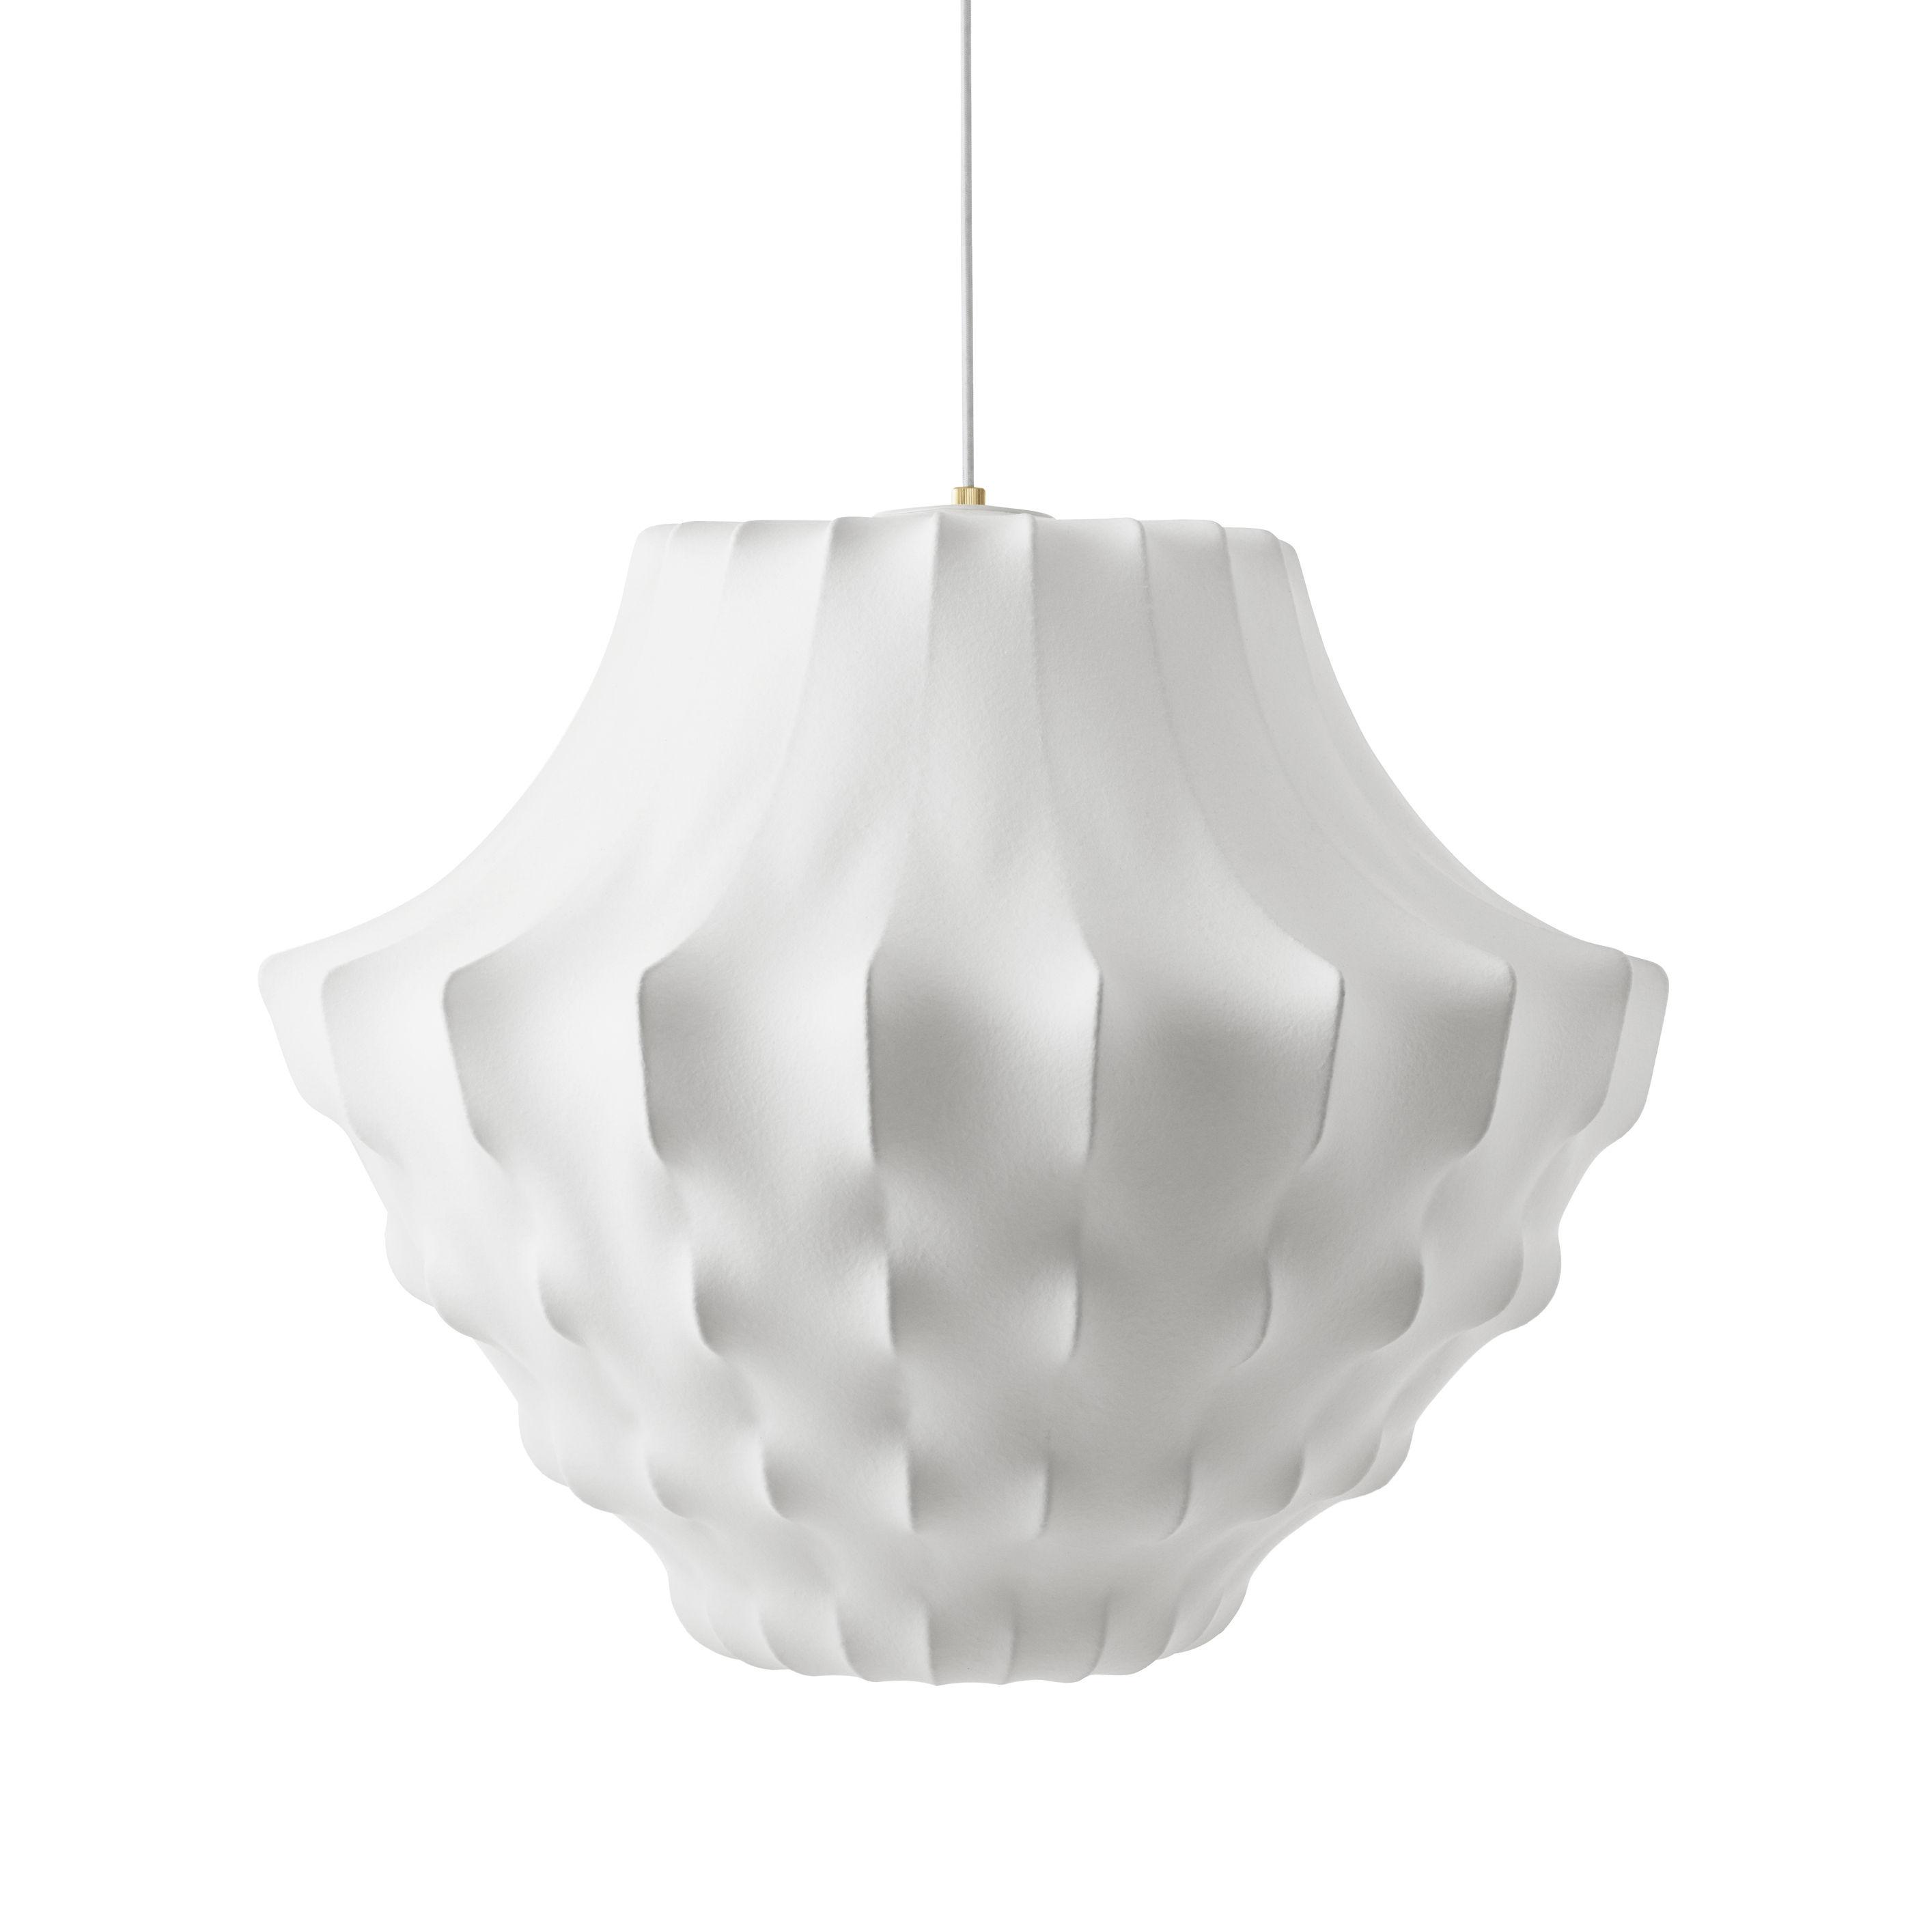 Illuminazione - Lampadari - Sospensione Phantom Large - / Ø 81 x H 64 cm - Resina cocon di Normann Copenhagen - Bianco - Acciaio, Resina cocoon